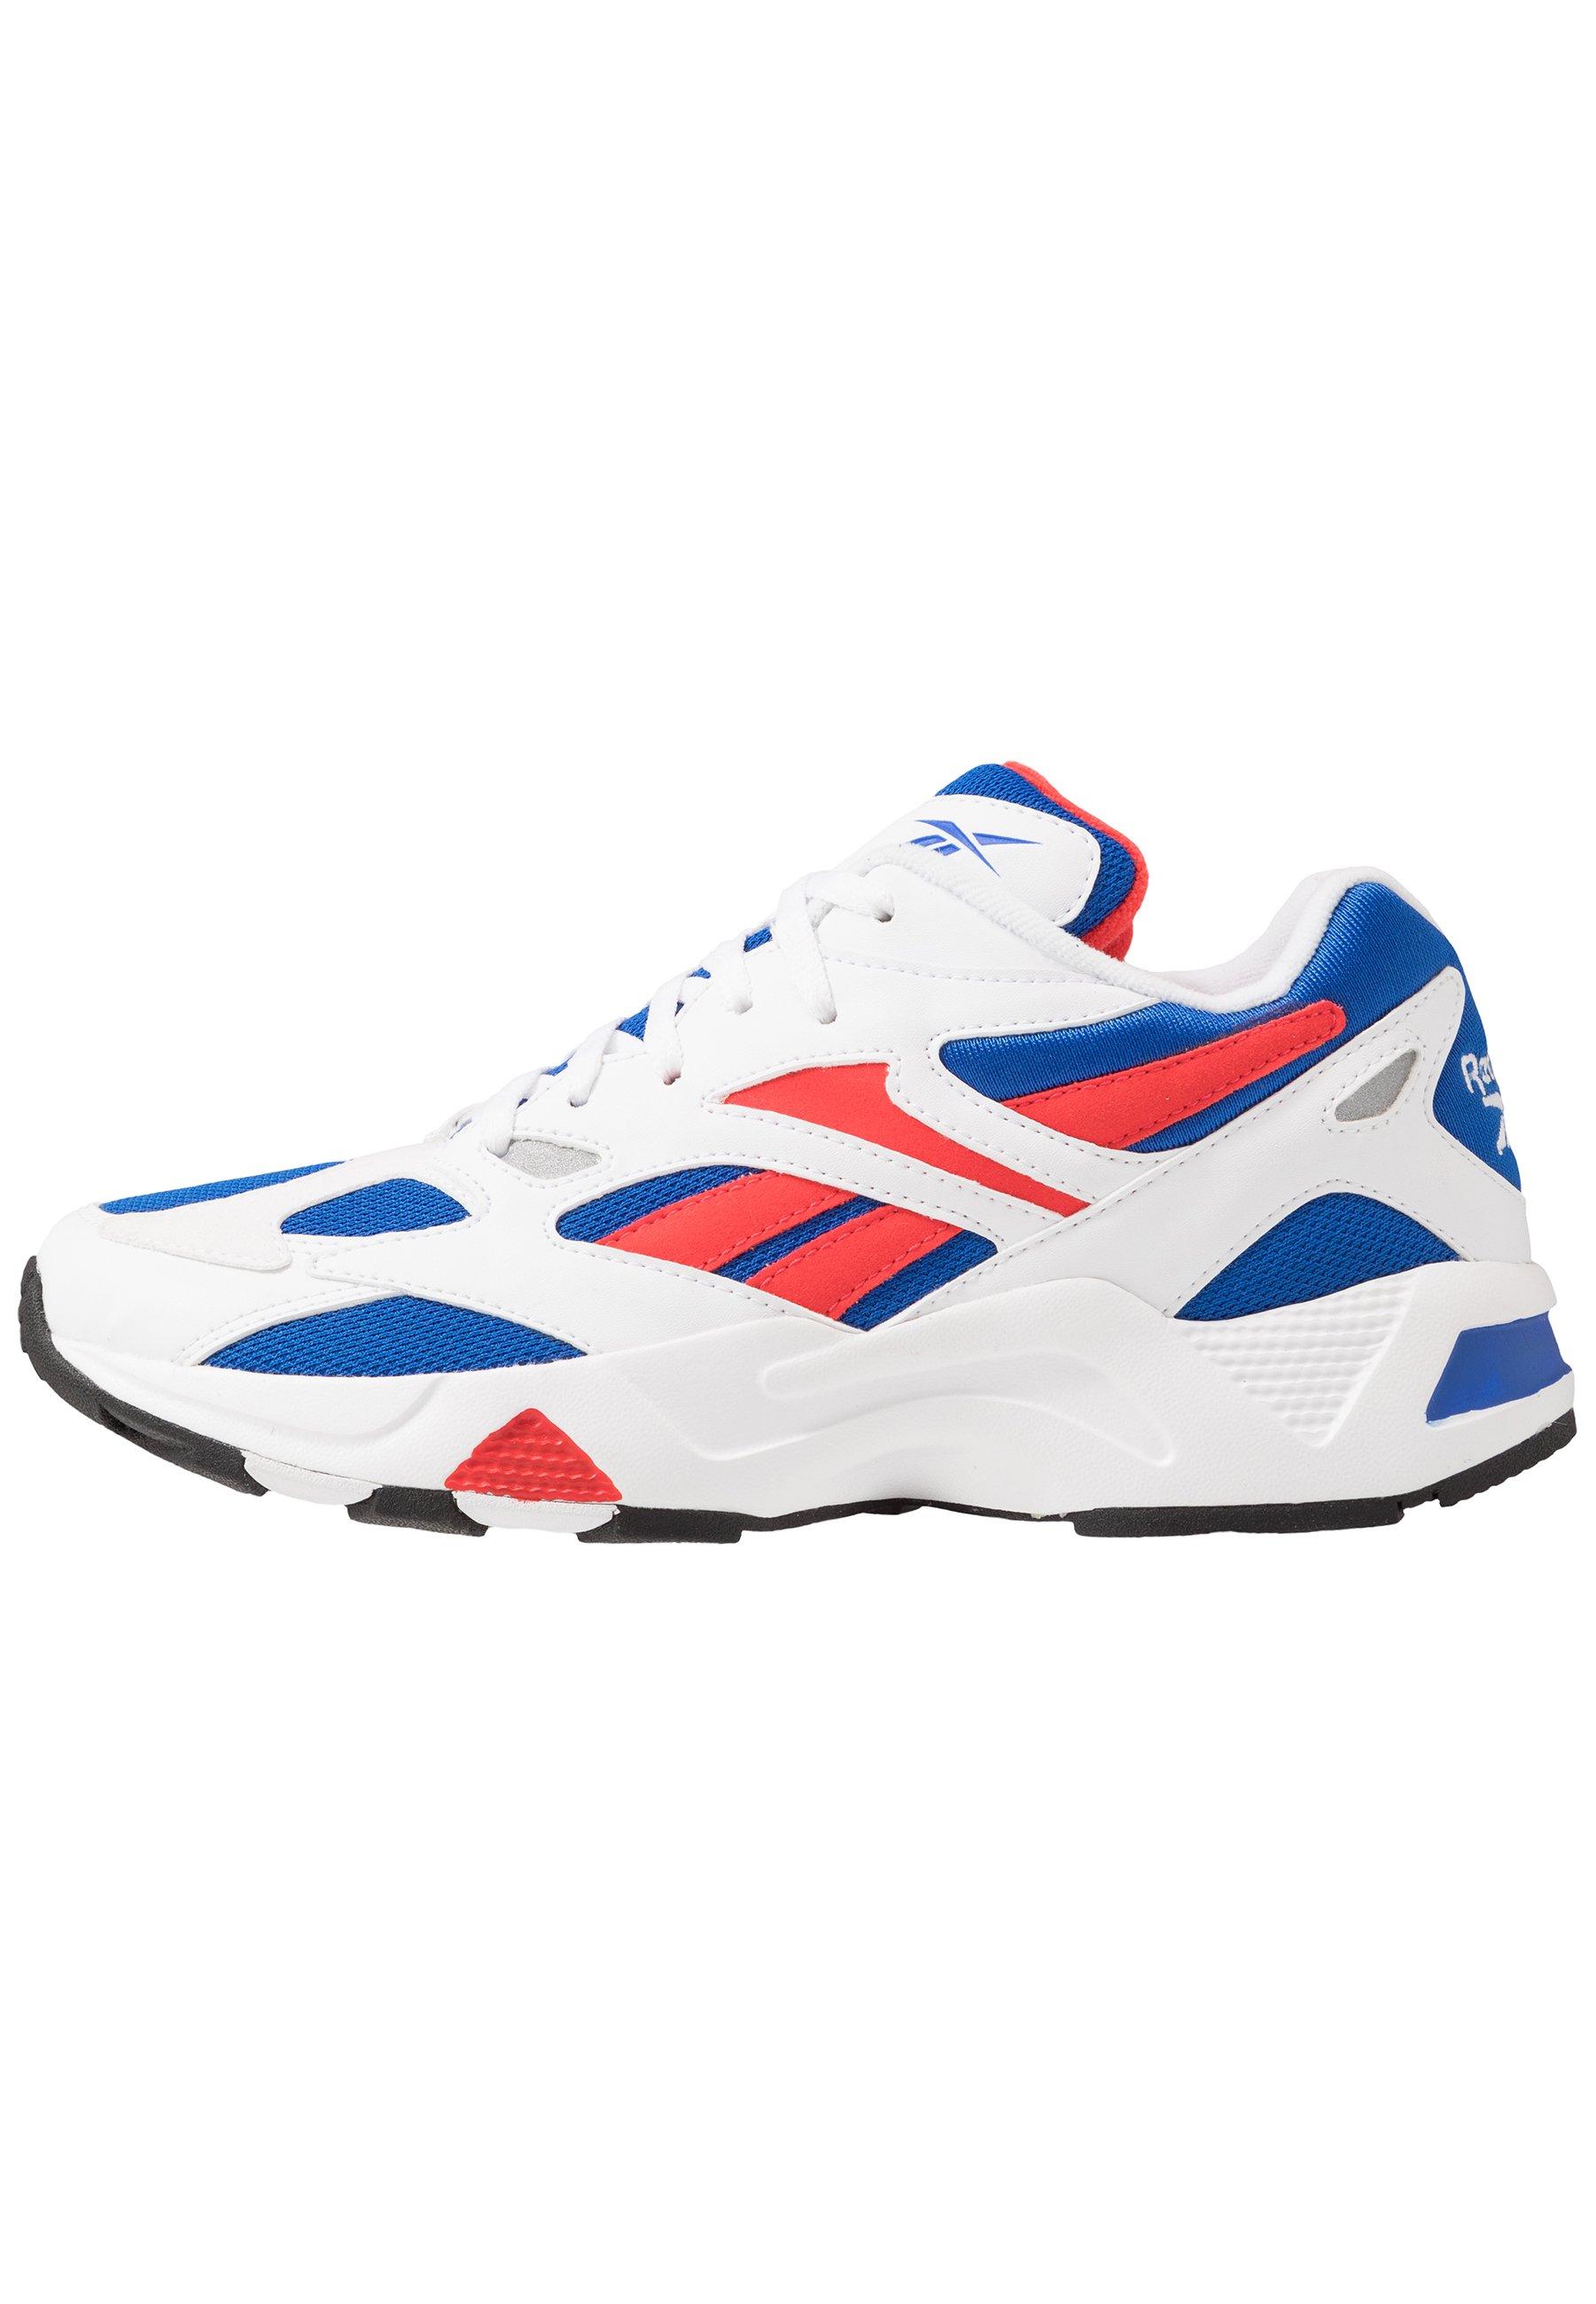 AZTREK 96 Sneakers whitehumble blueradiant red